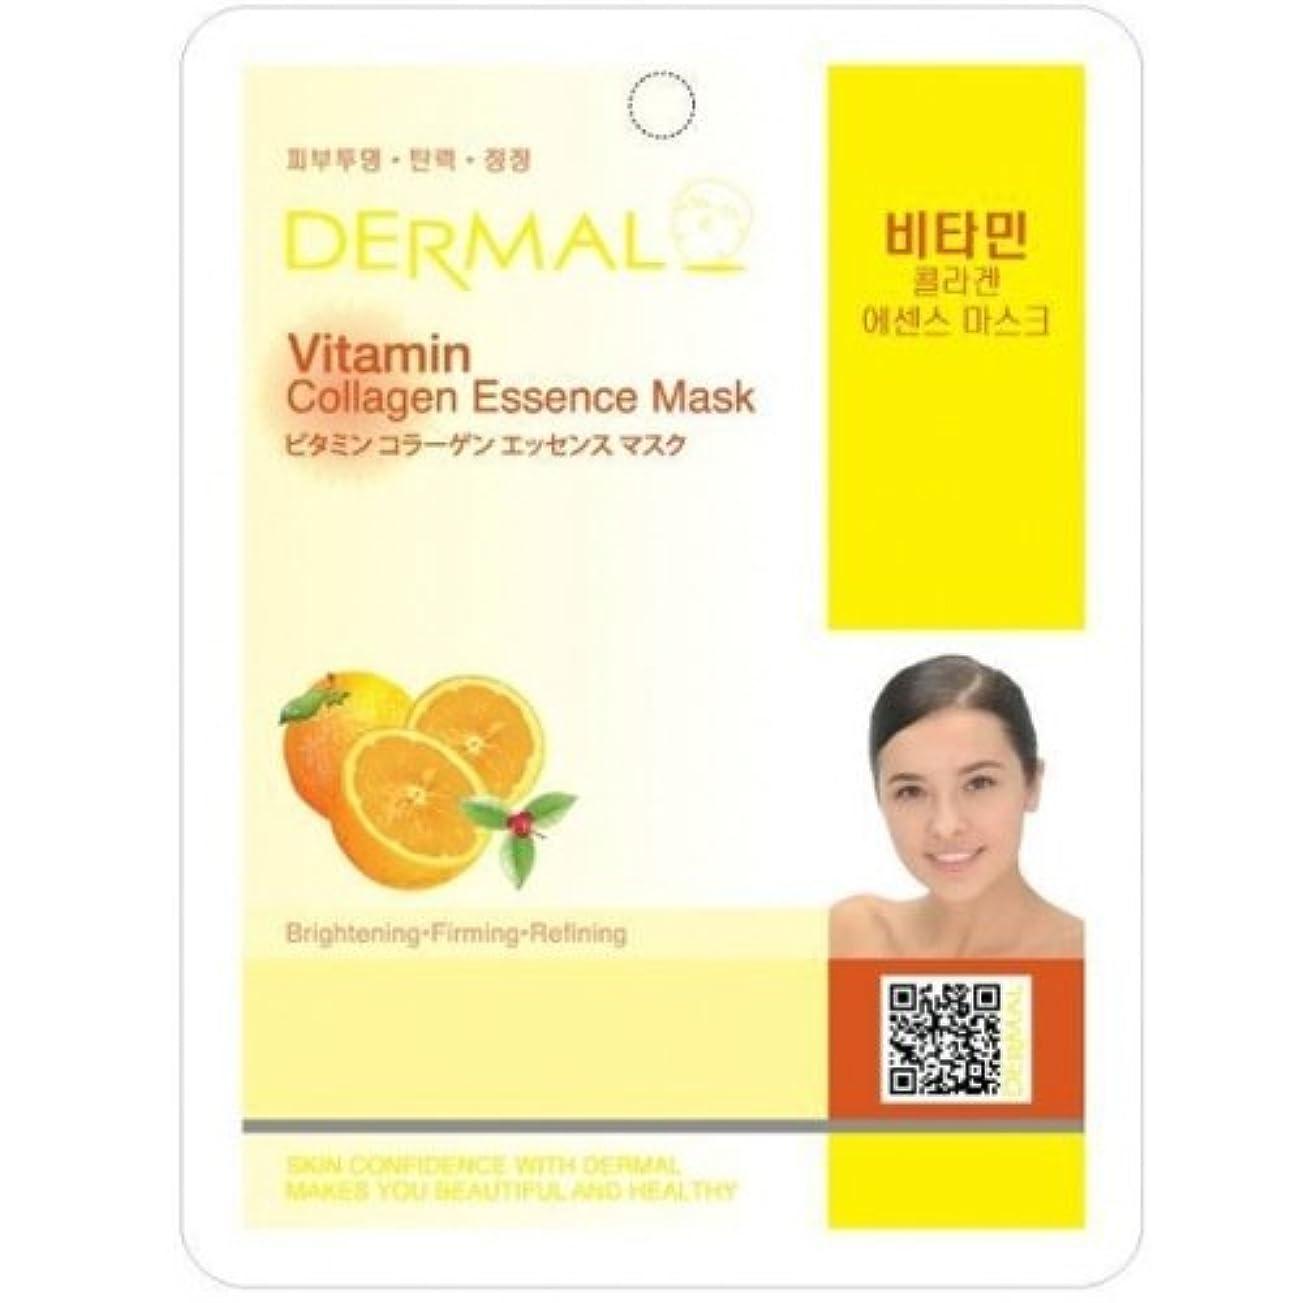 【DERMAL】ダーマル シートマスク ビタミン 10枚セット/保湿/フェイスマスク/フェイスパック/マスクパック/韓国コスメ [メール便]